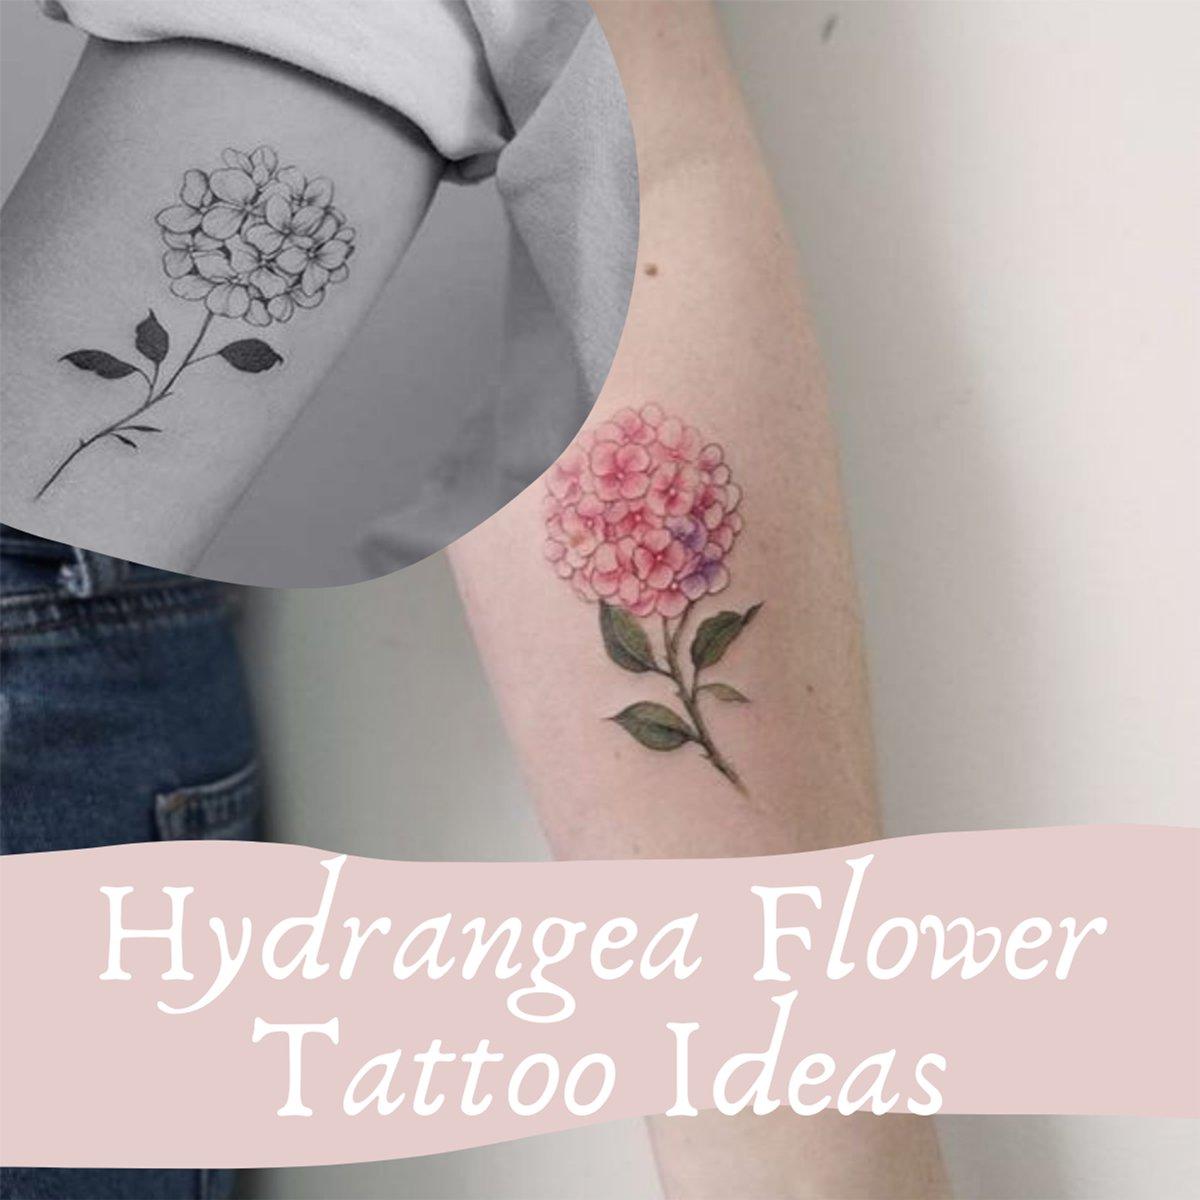 Hydrangea Flower Tattoo Ideas